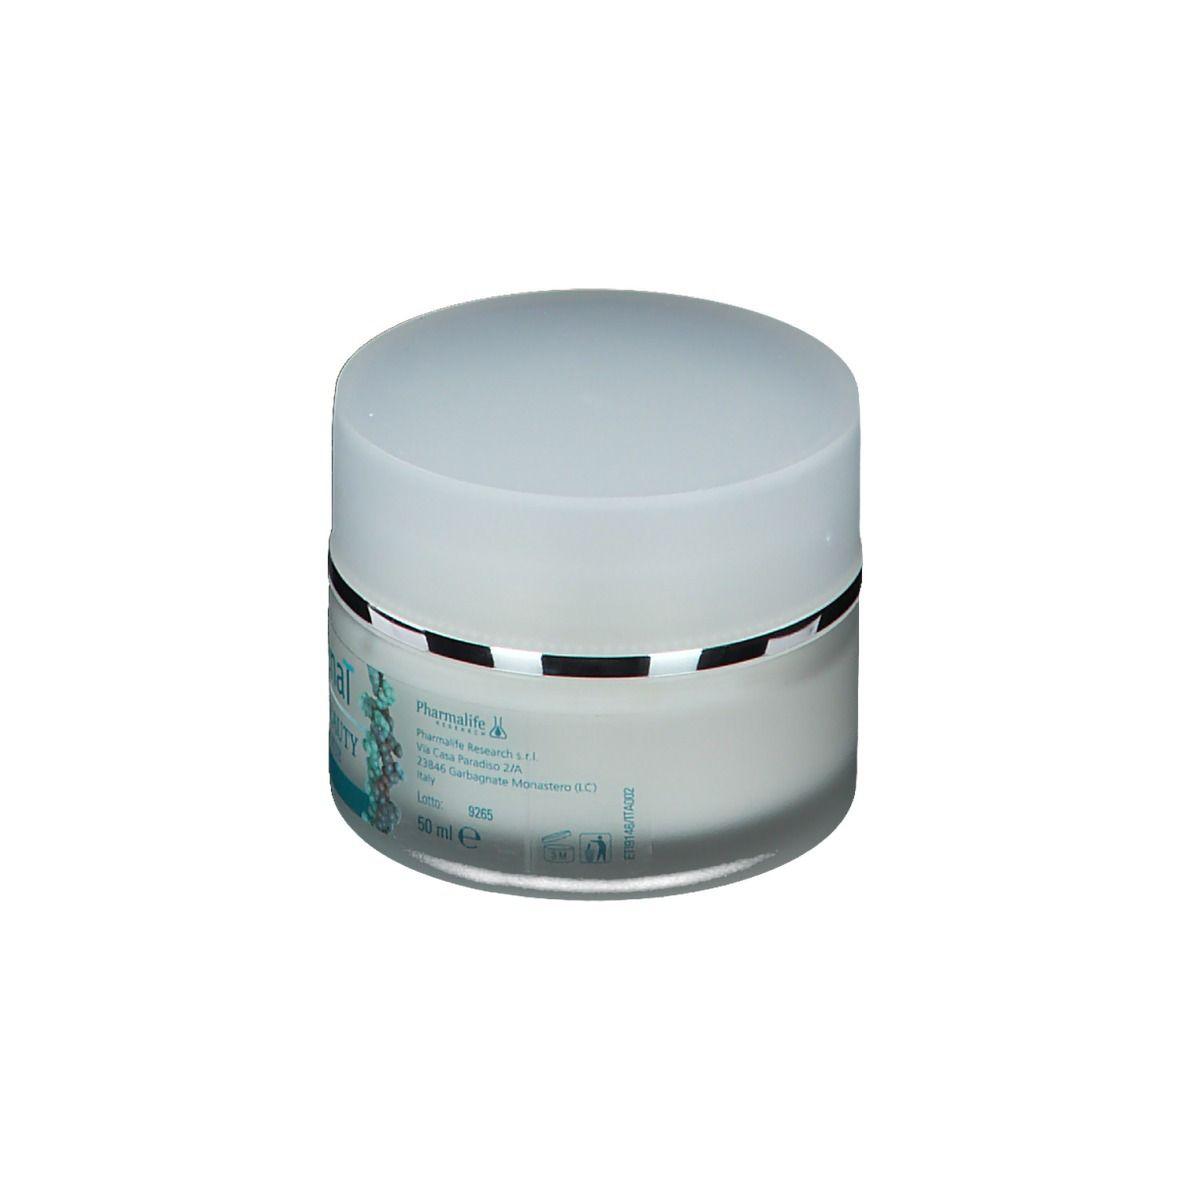 Pharmalife Research Collagenal Crema Viso Notte Sleeping..